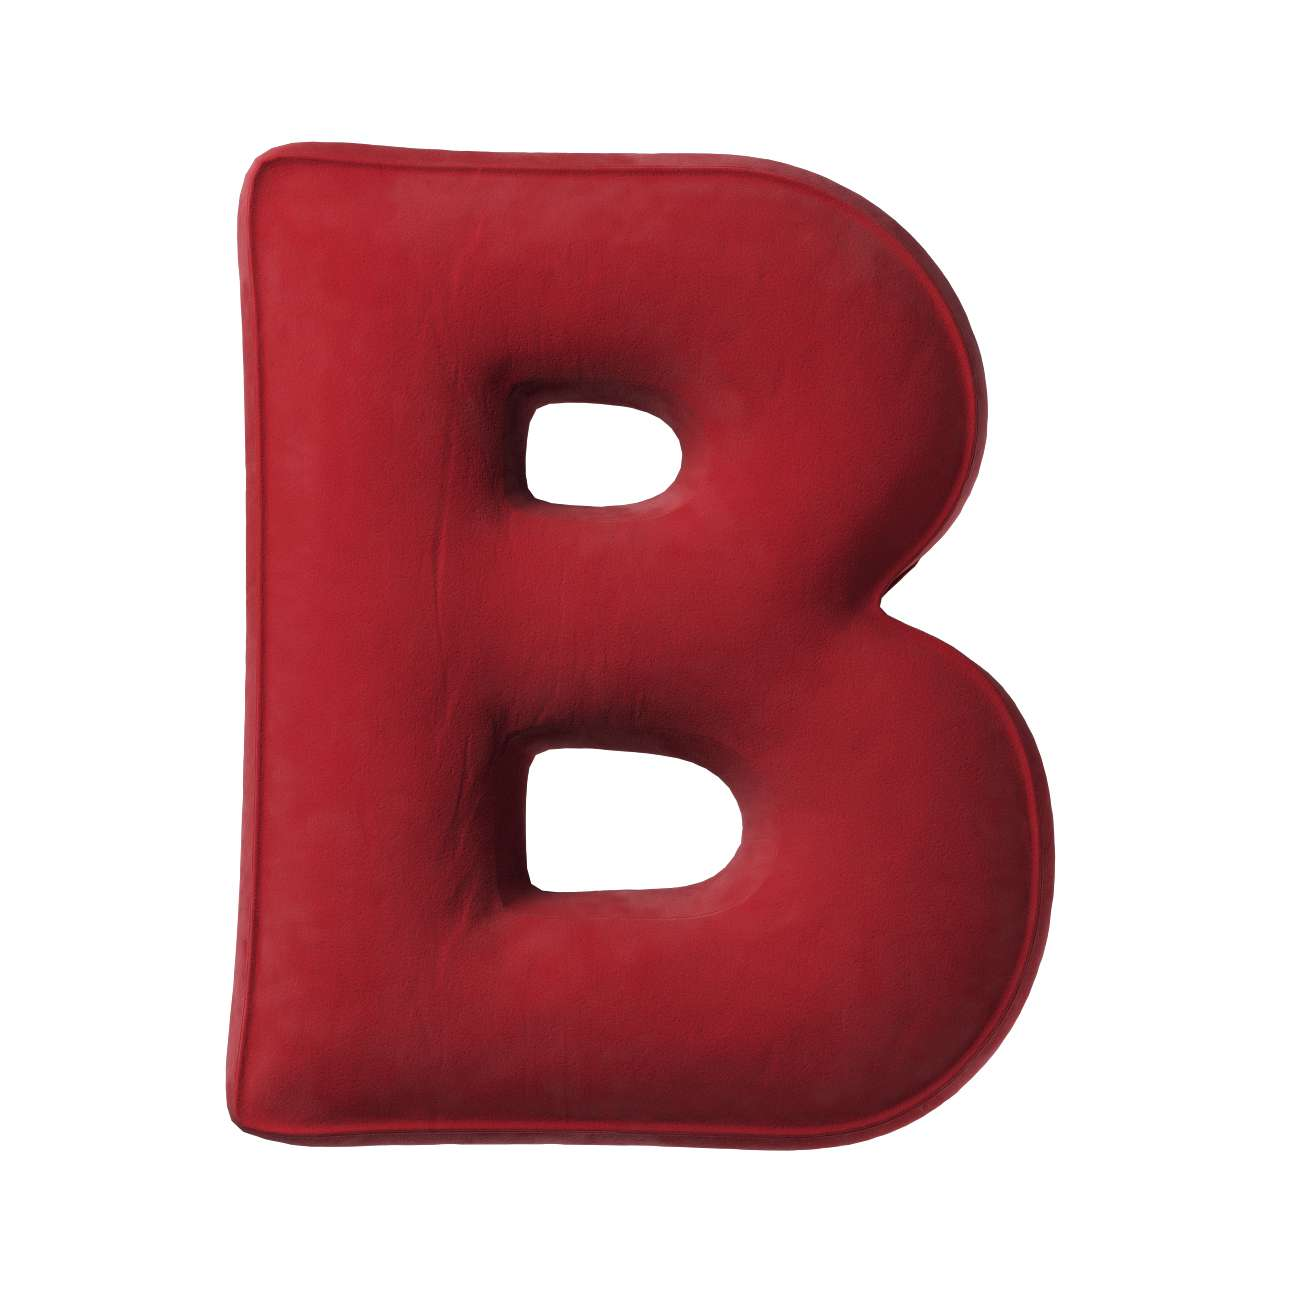 Polštář písmenko B v kolekci Posh Velvet, látka: 704-15